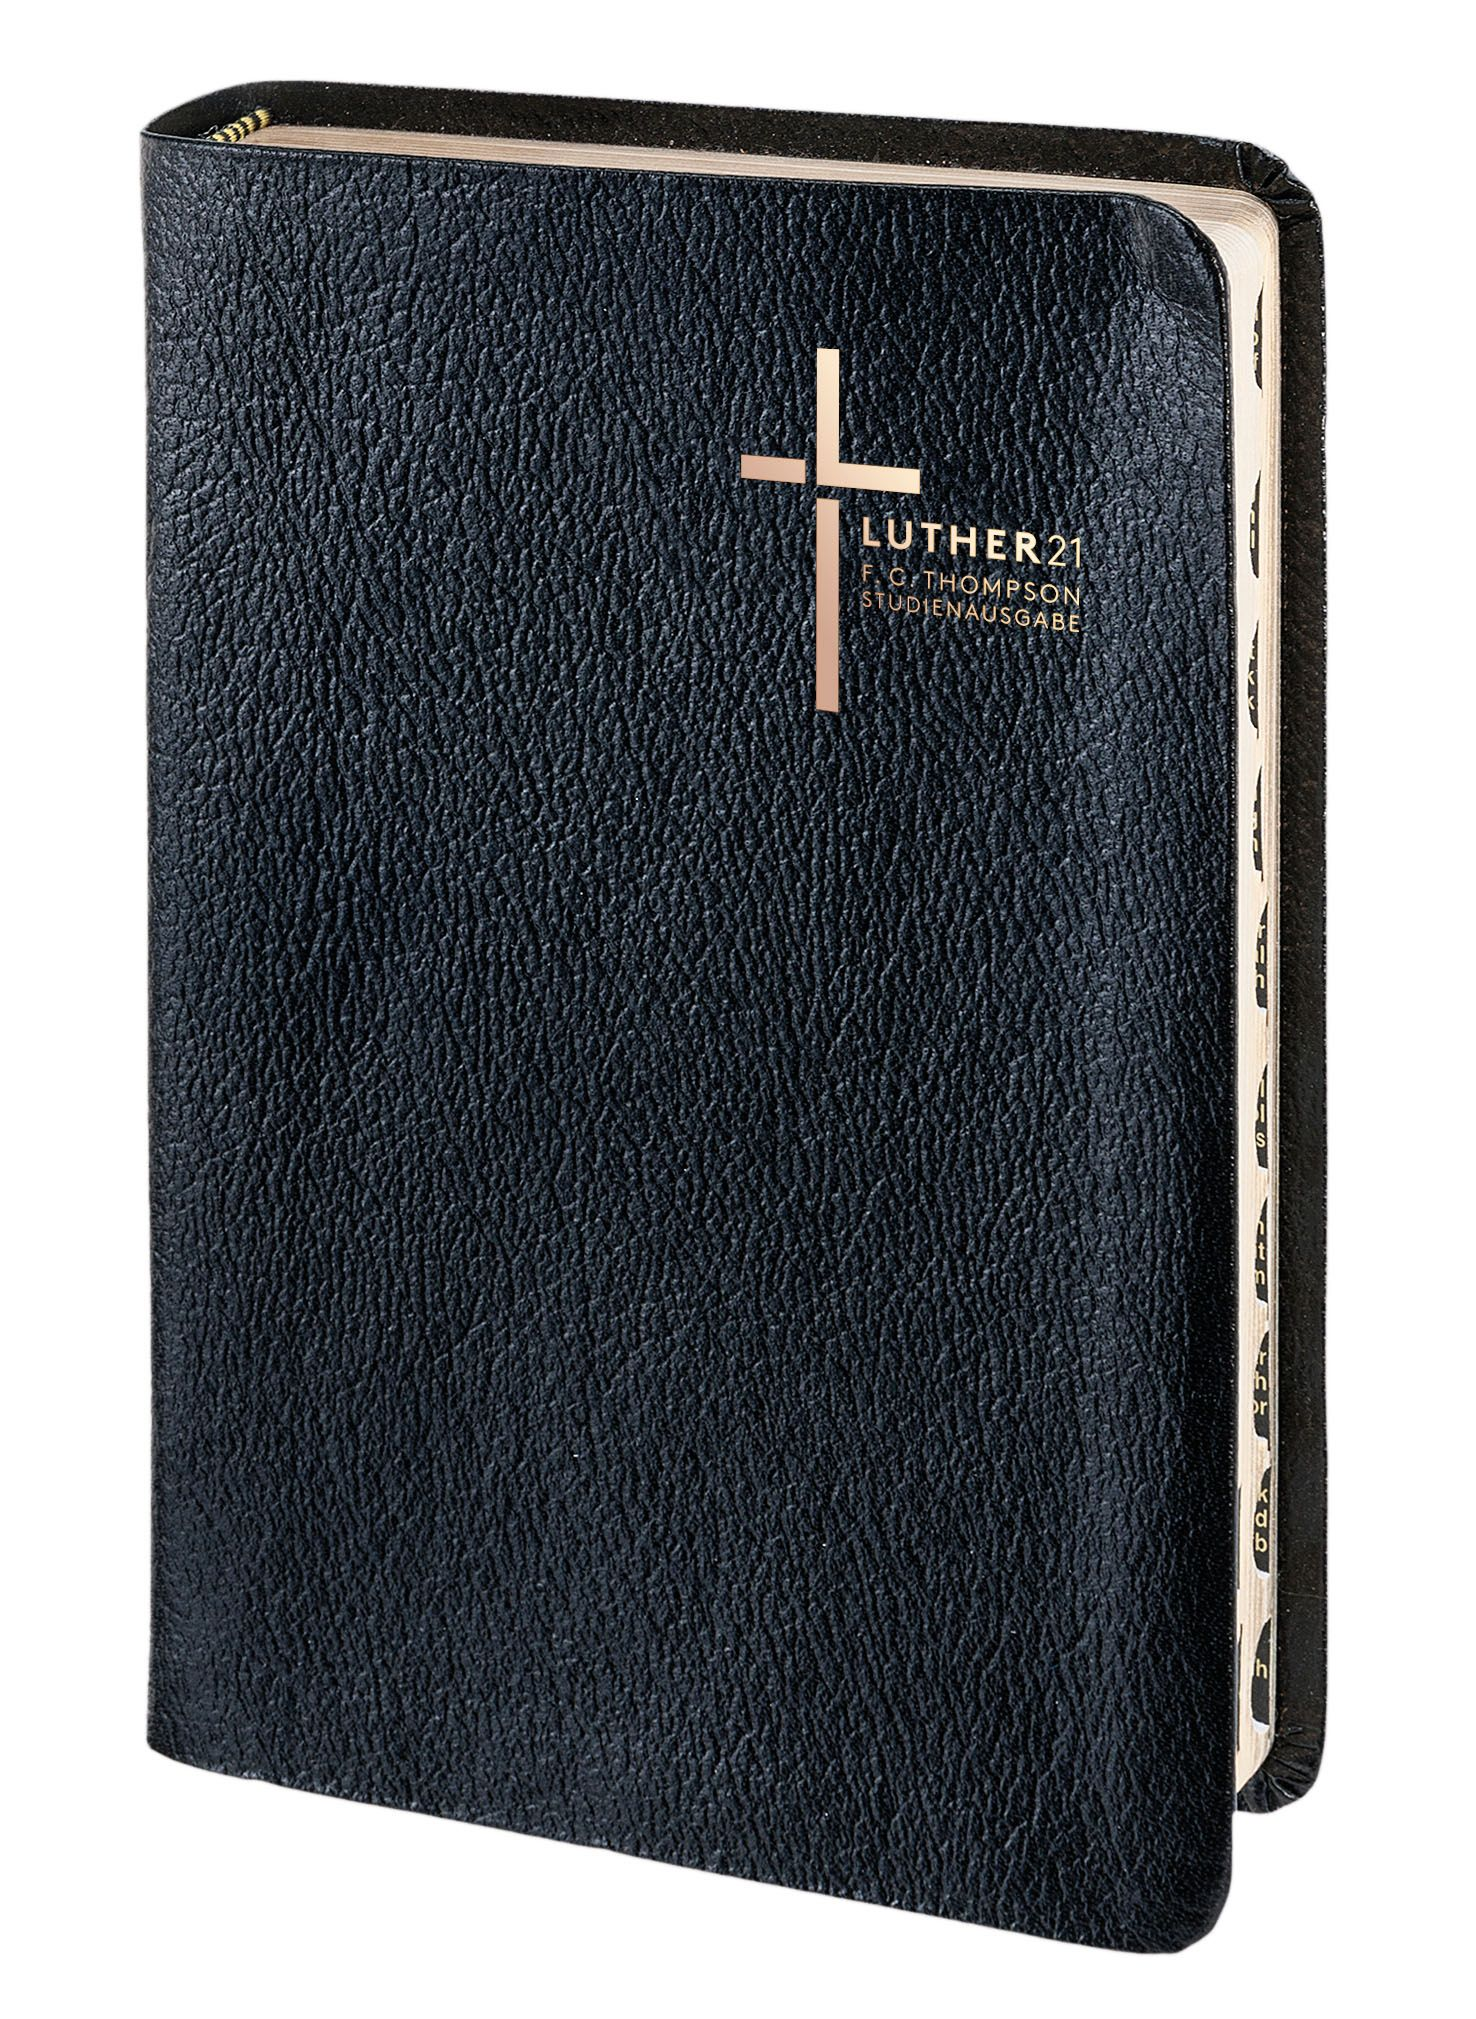 Luther21 - F.C.Thompson Studienausgabe - Grossausgabe Lederfaserstoff